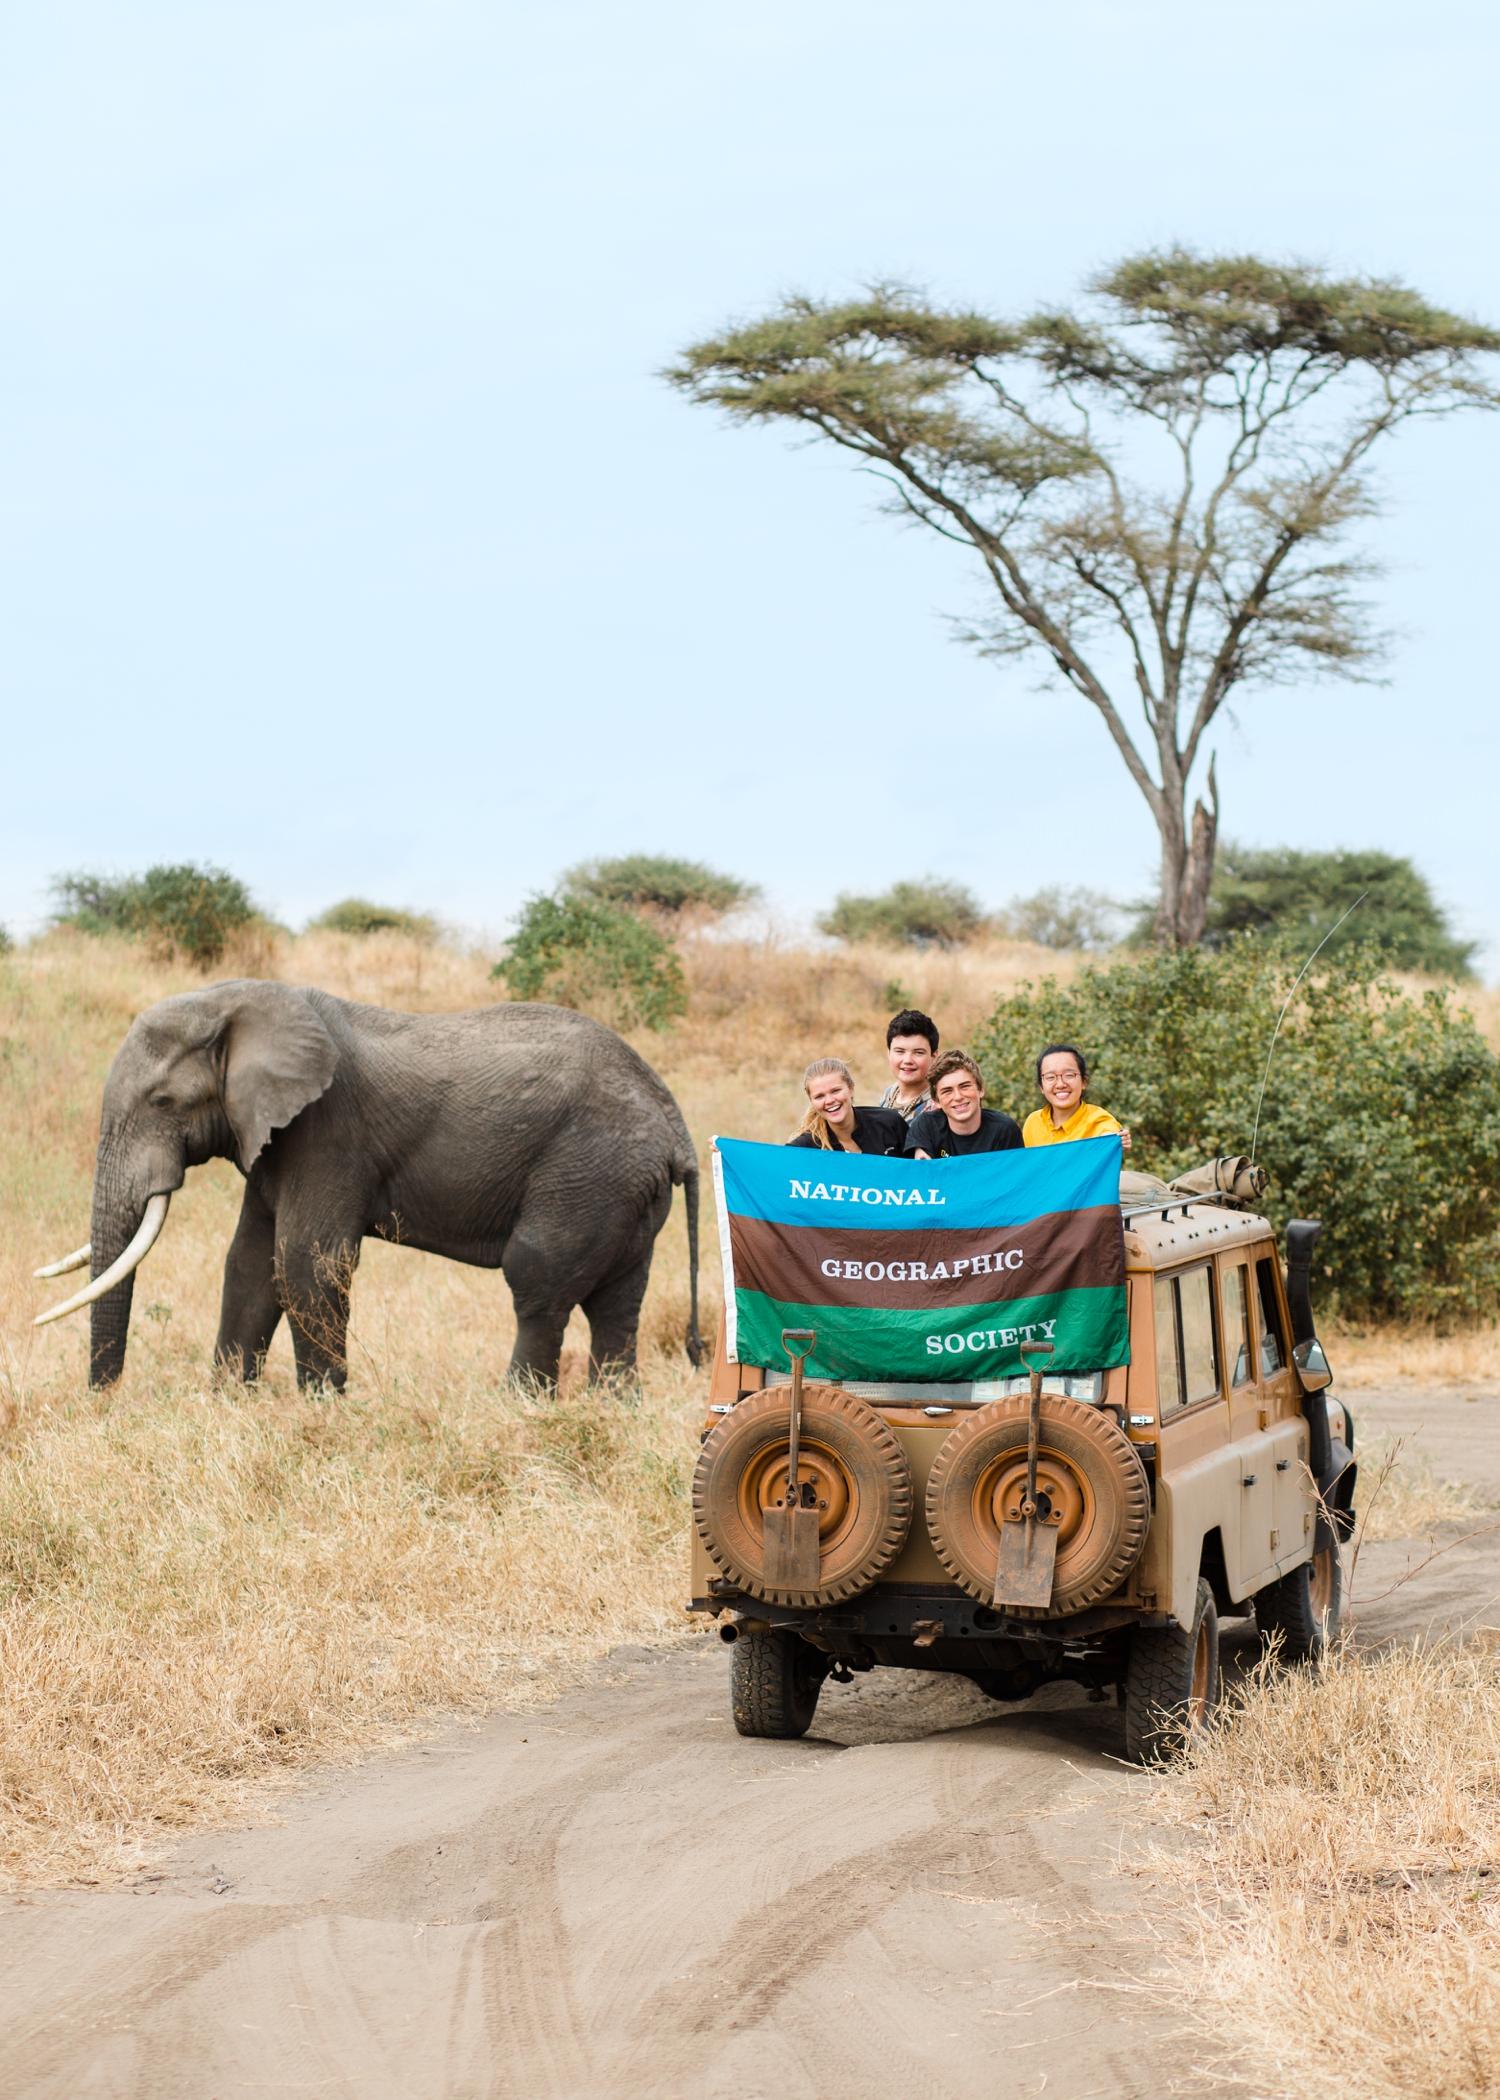 cameron-zegers-travel-photographer-nat-geo-expeditions-tanzania.jpg